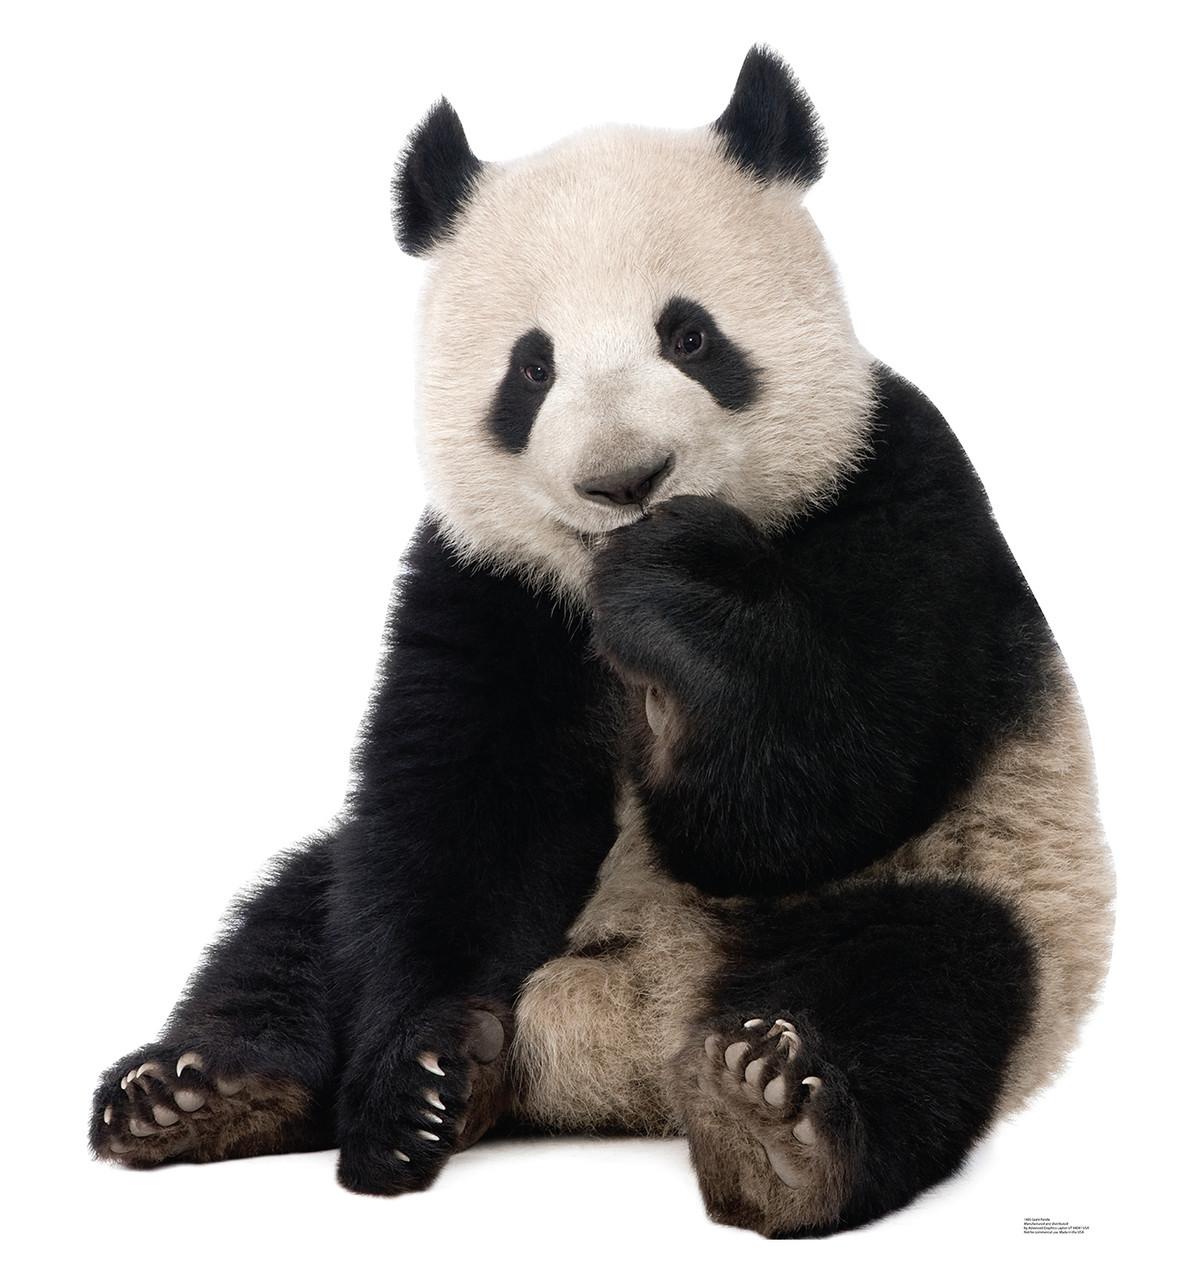 Life-size Giant Panda Cardboard Standup